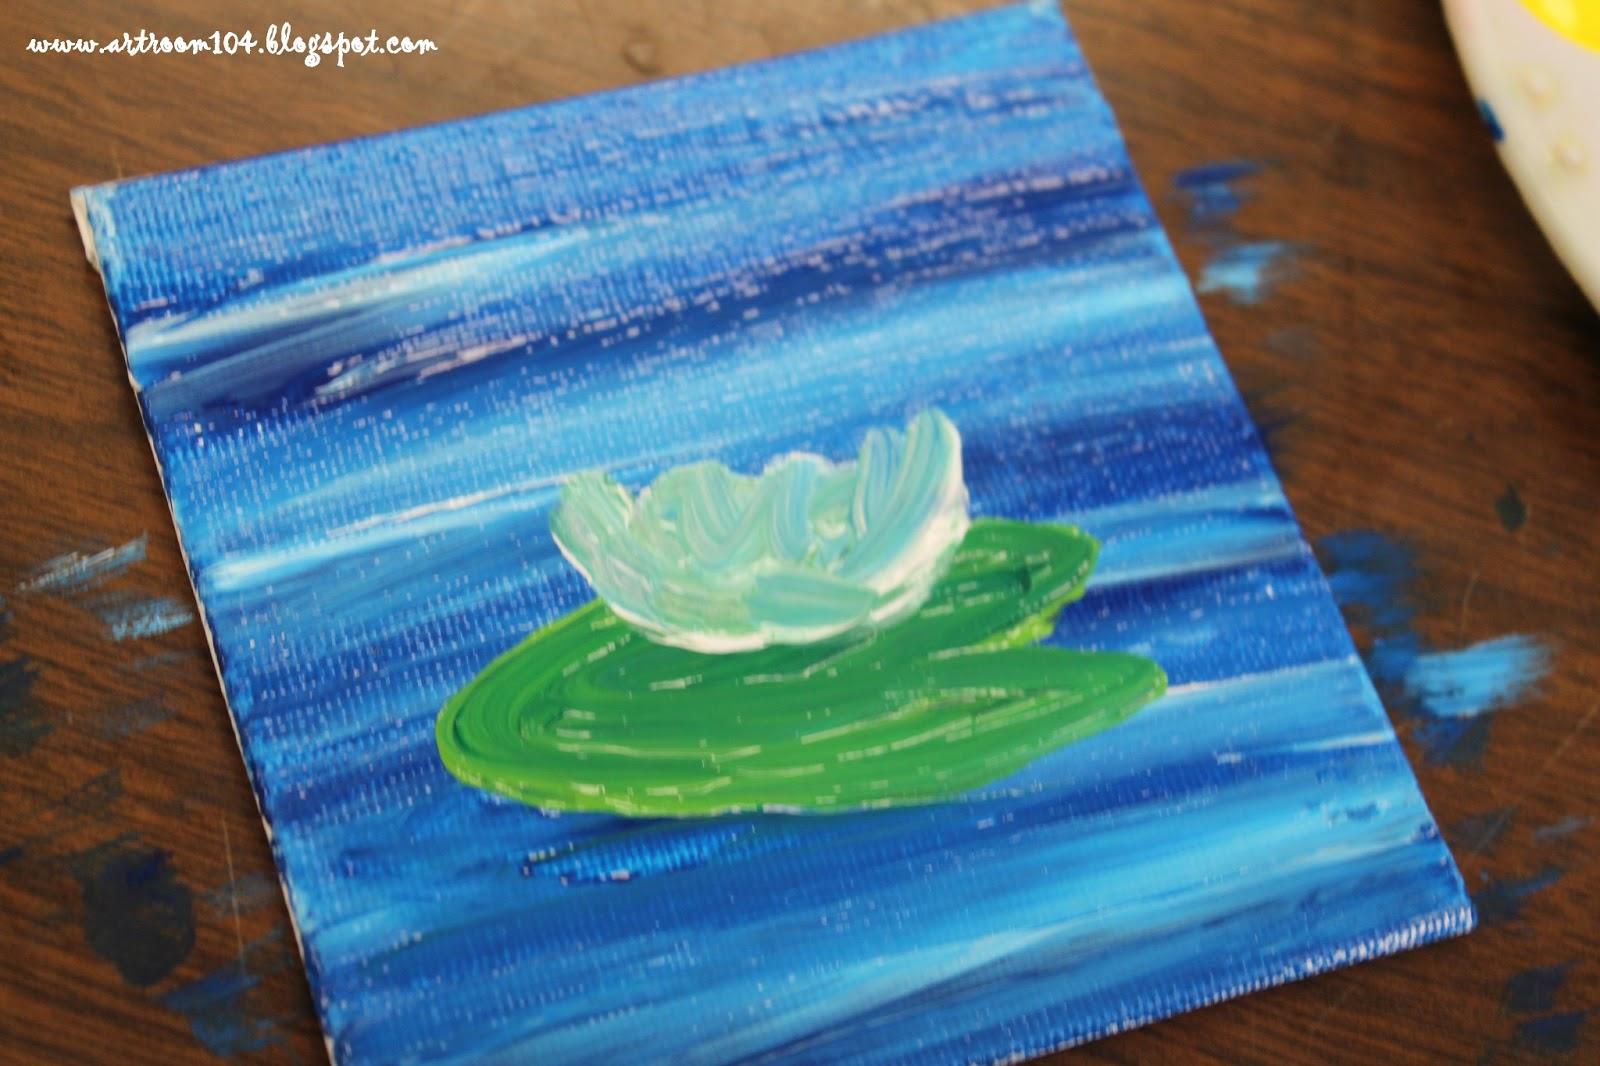 Art Room 104: YAM: Artistic Staff Development, Post #2